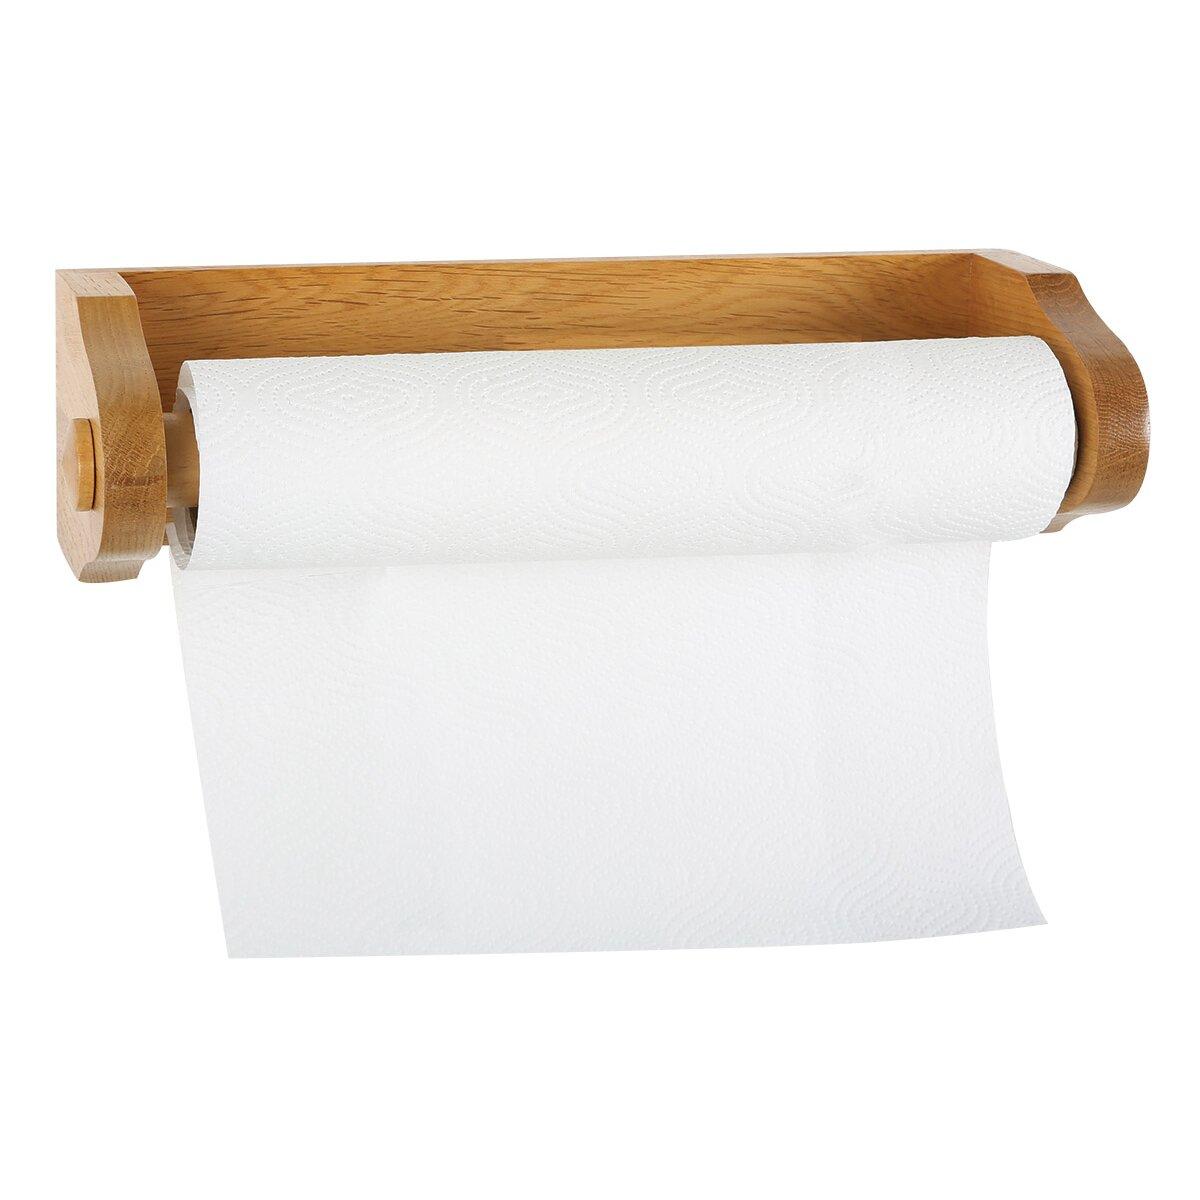 design house dalton wall mounted paper towel holder reviews wayfair. Black Bedroom Furniture Sets. Home Design Ideas